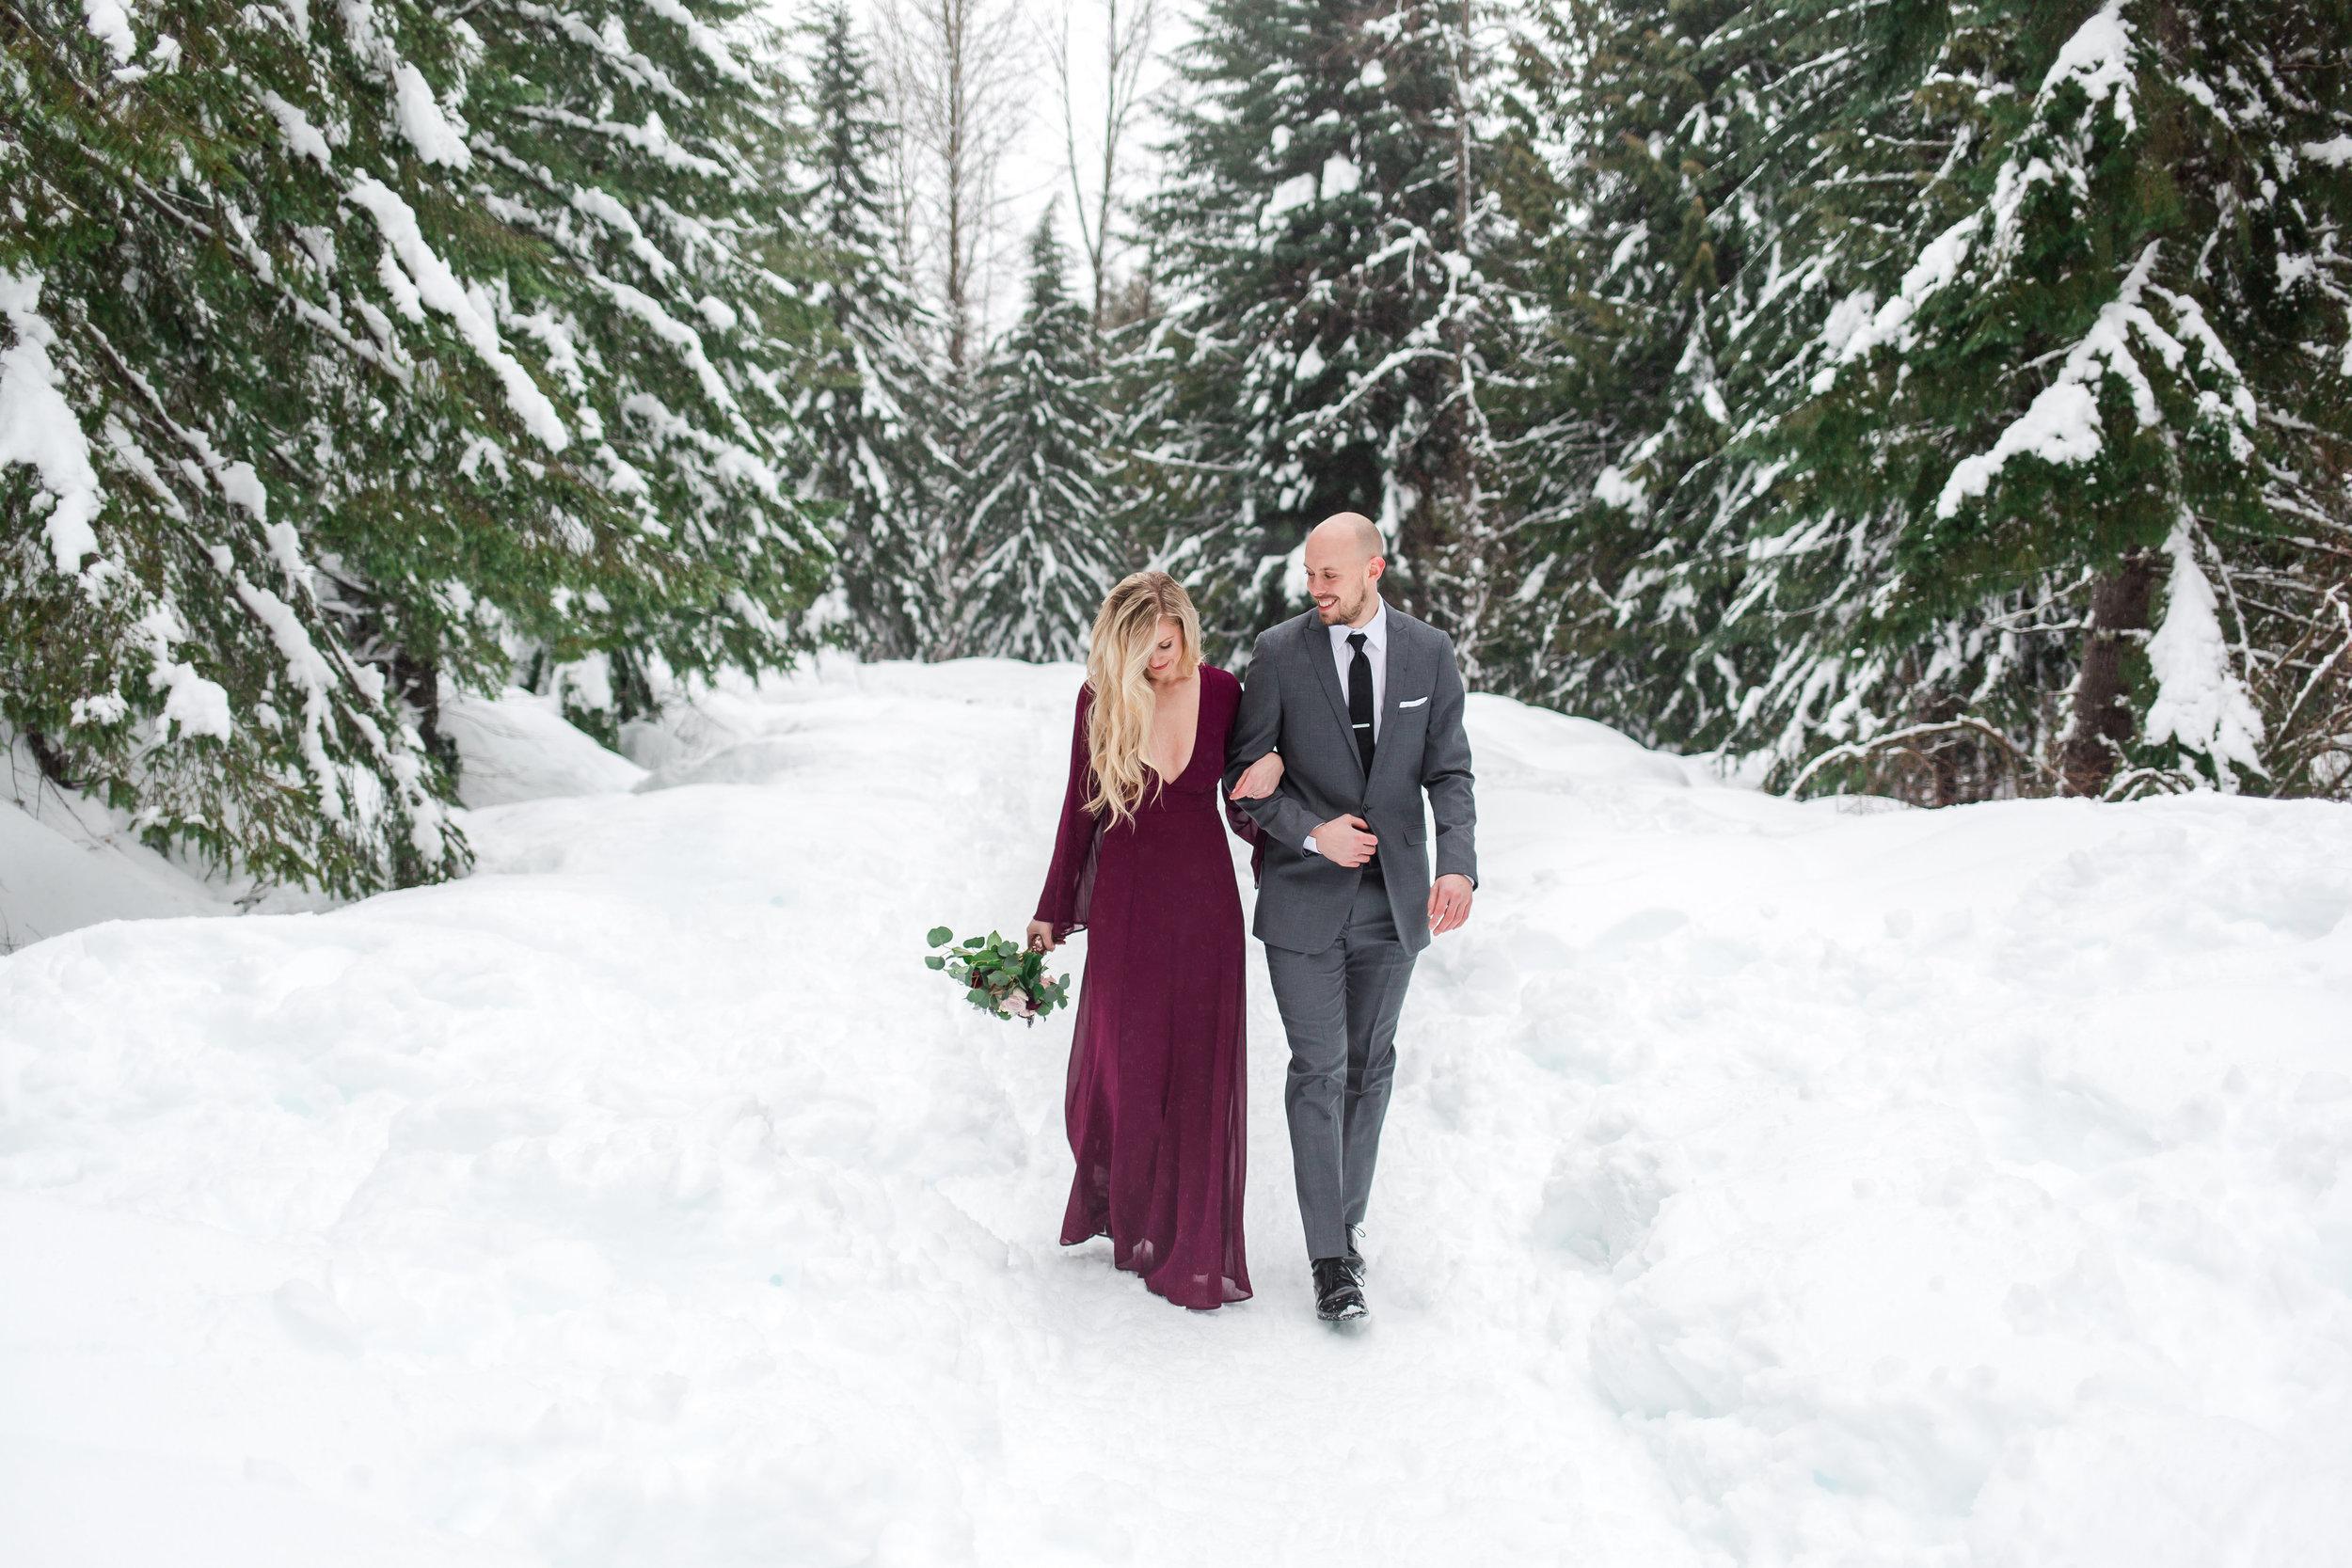 snoqualmie-pass-engagement-photos